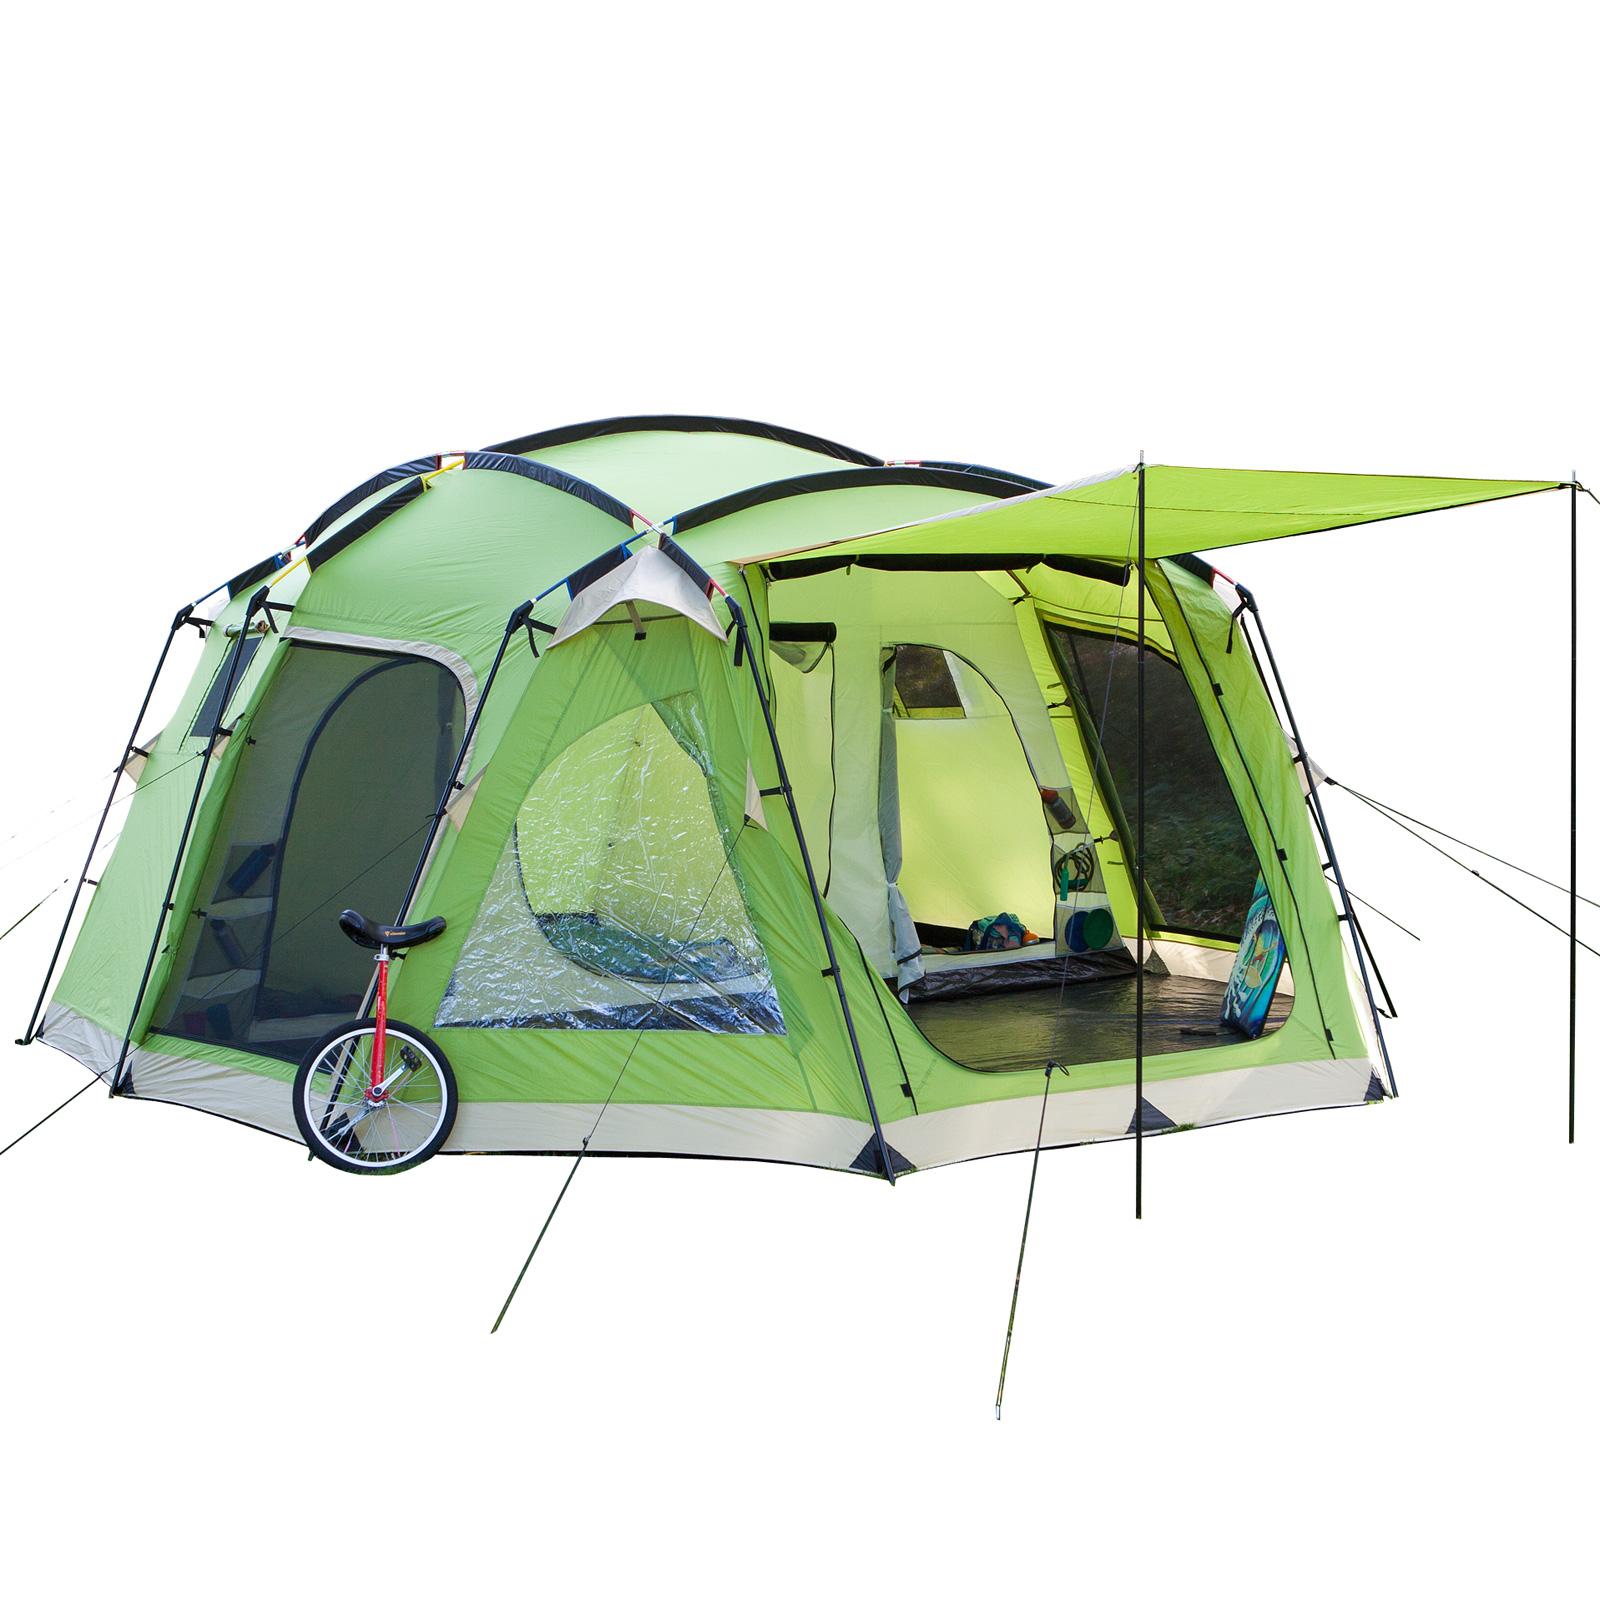 familienzelt skandika copenhagen 6 bis 8 mann personen camping zelte 5000mm ws gr n max. Black Bedroom Furniture Sets. Home Design Ideas